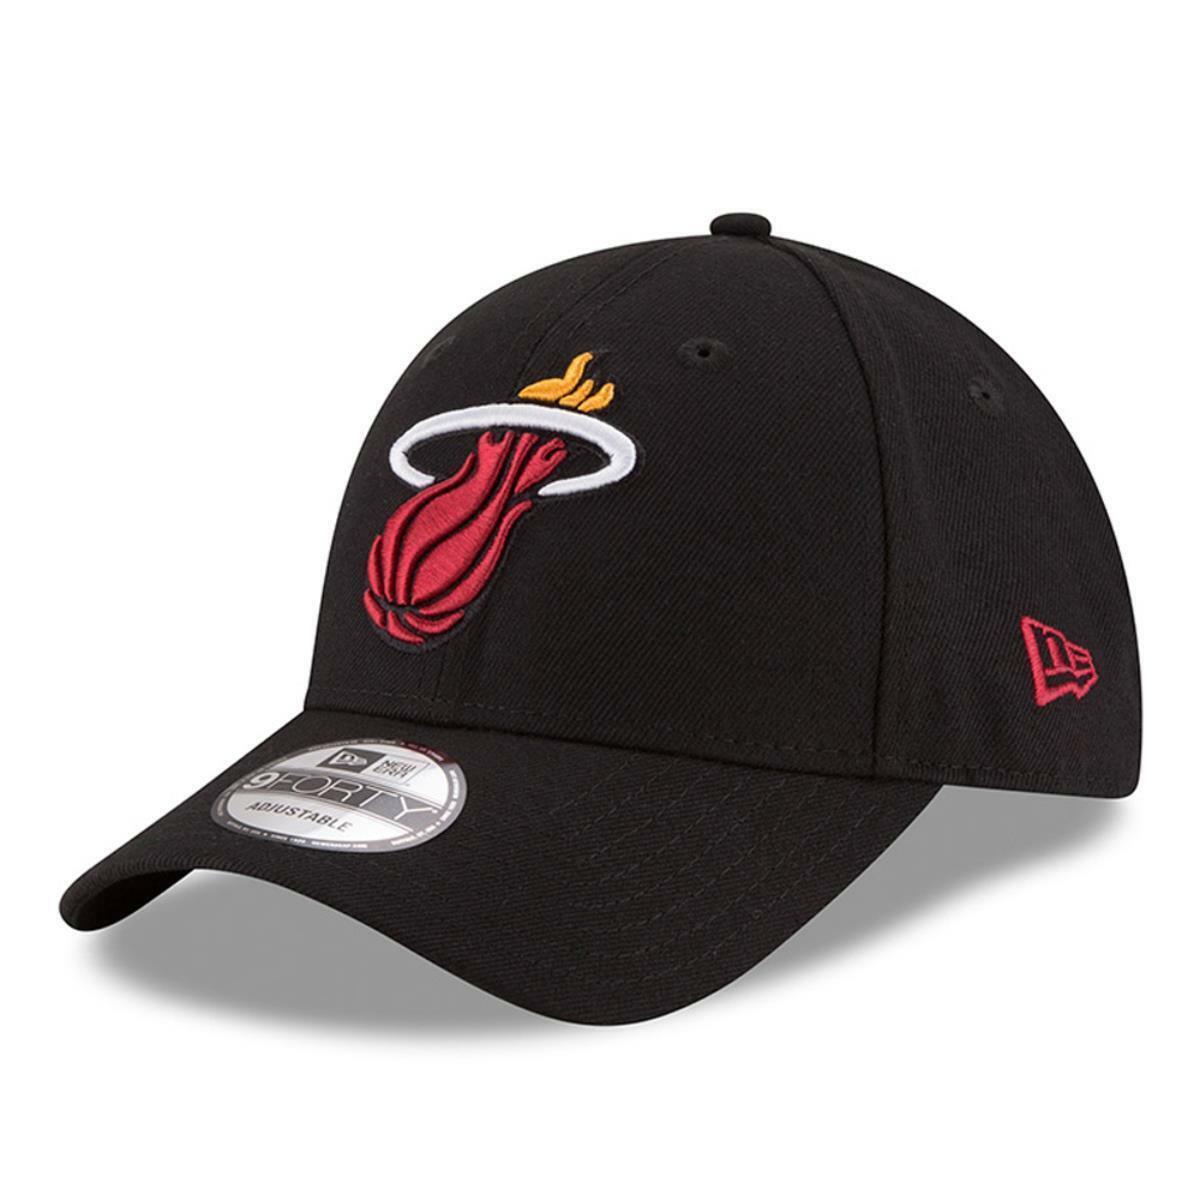 new era new era 11405603 miami cappello unisex otc